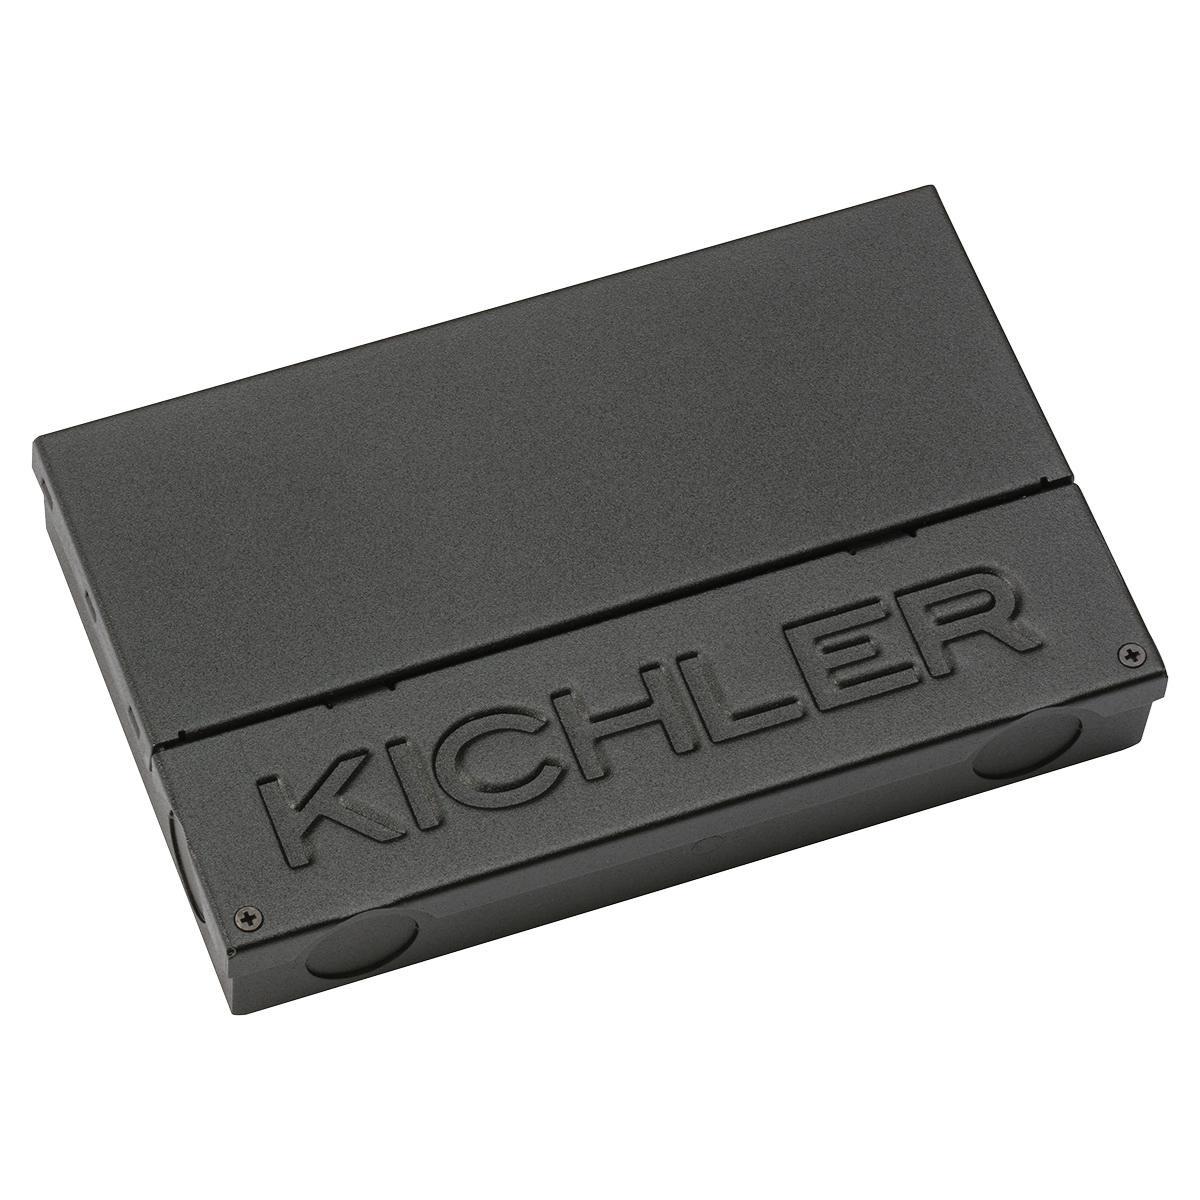 Kichler 6TD24V60BKT Dimmable Power Supply Textured Black - Indoor ...